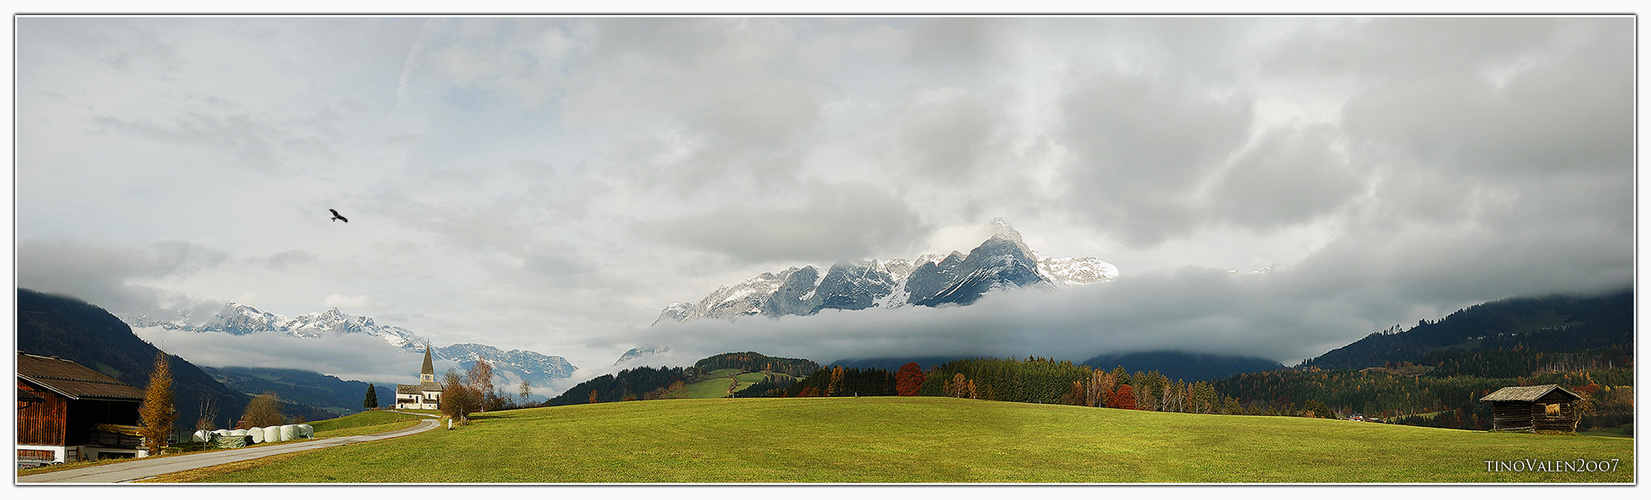 mountains panorama in austria,